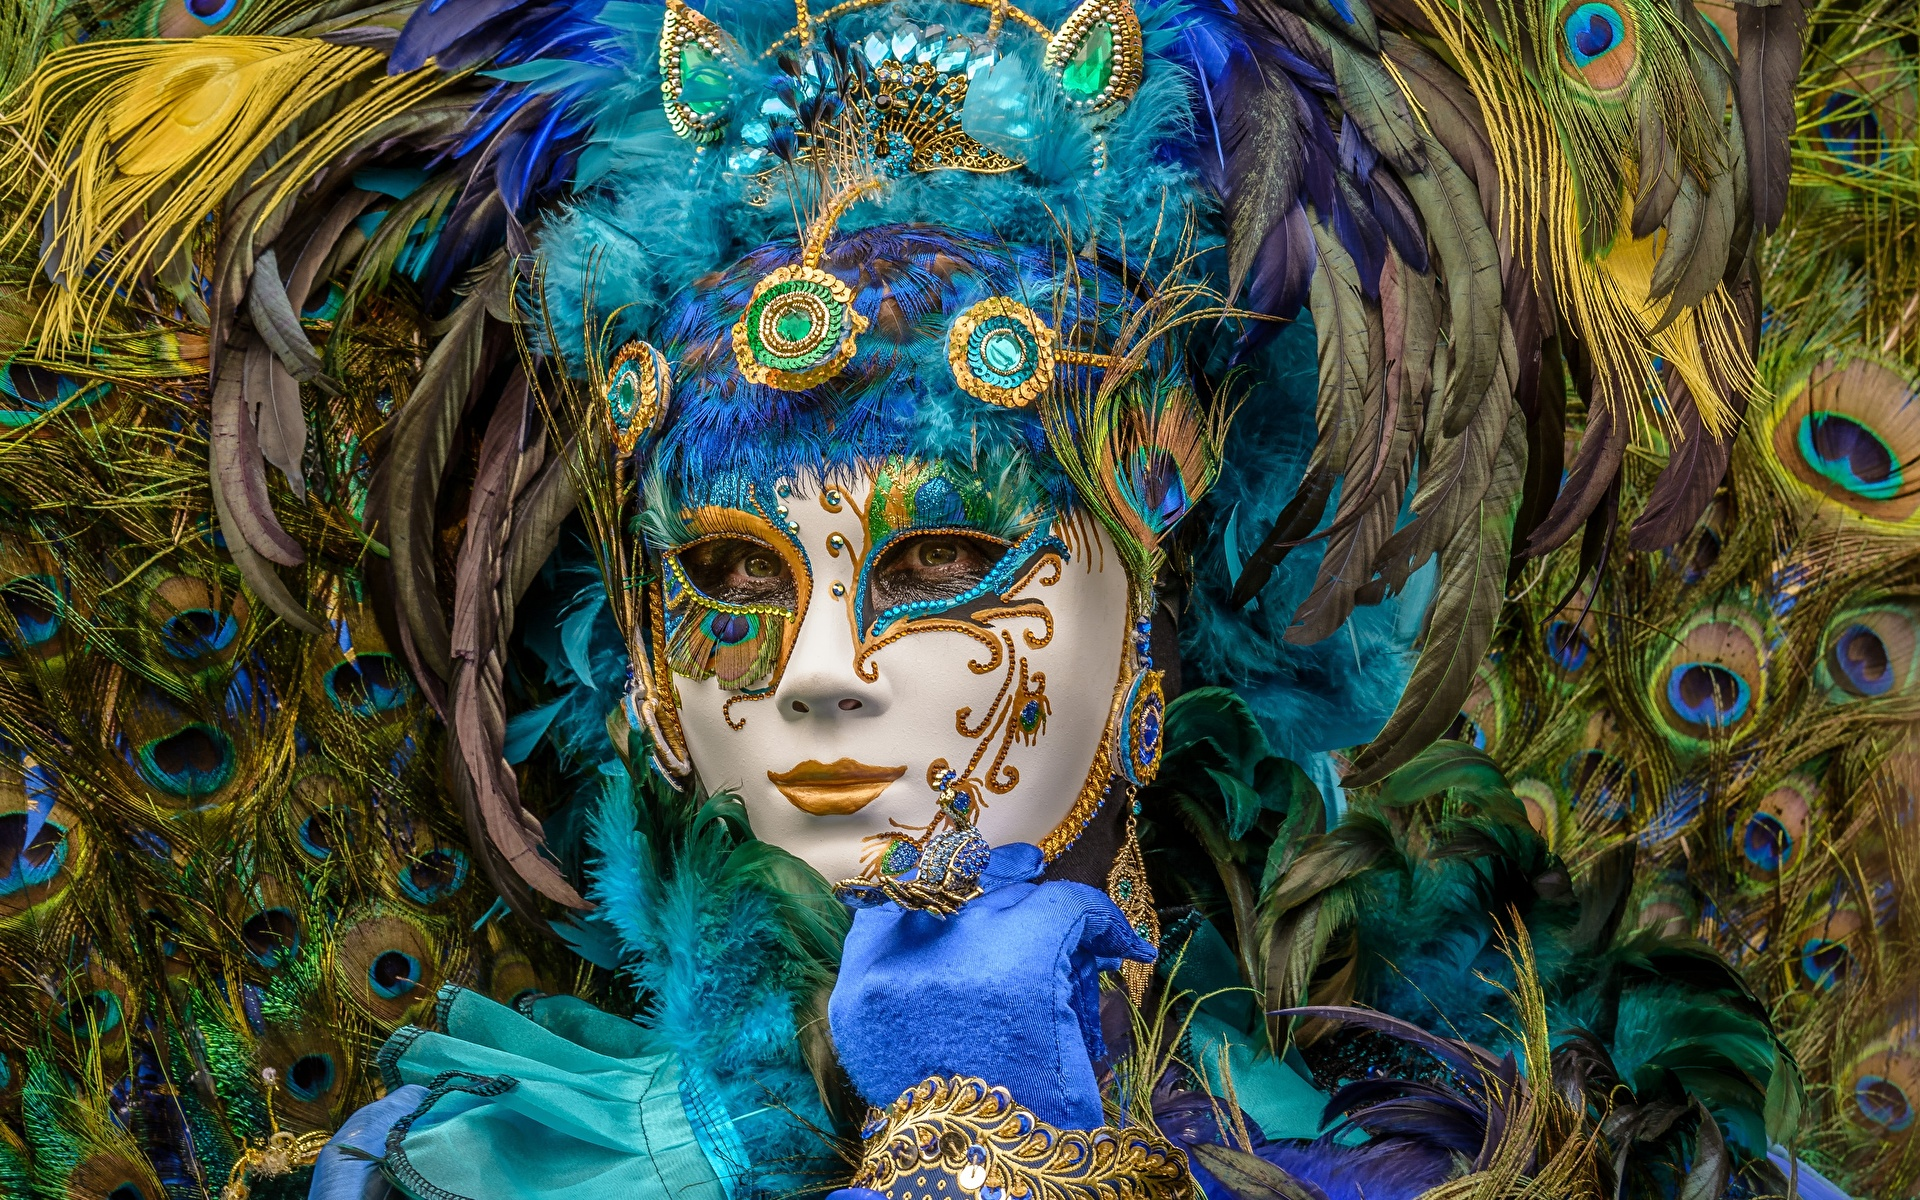 Fondos De Pantalla De Carnaval Wallpapers Hd